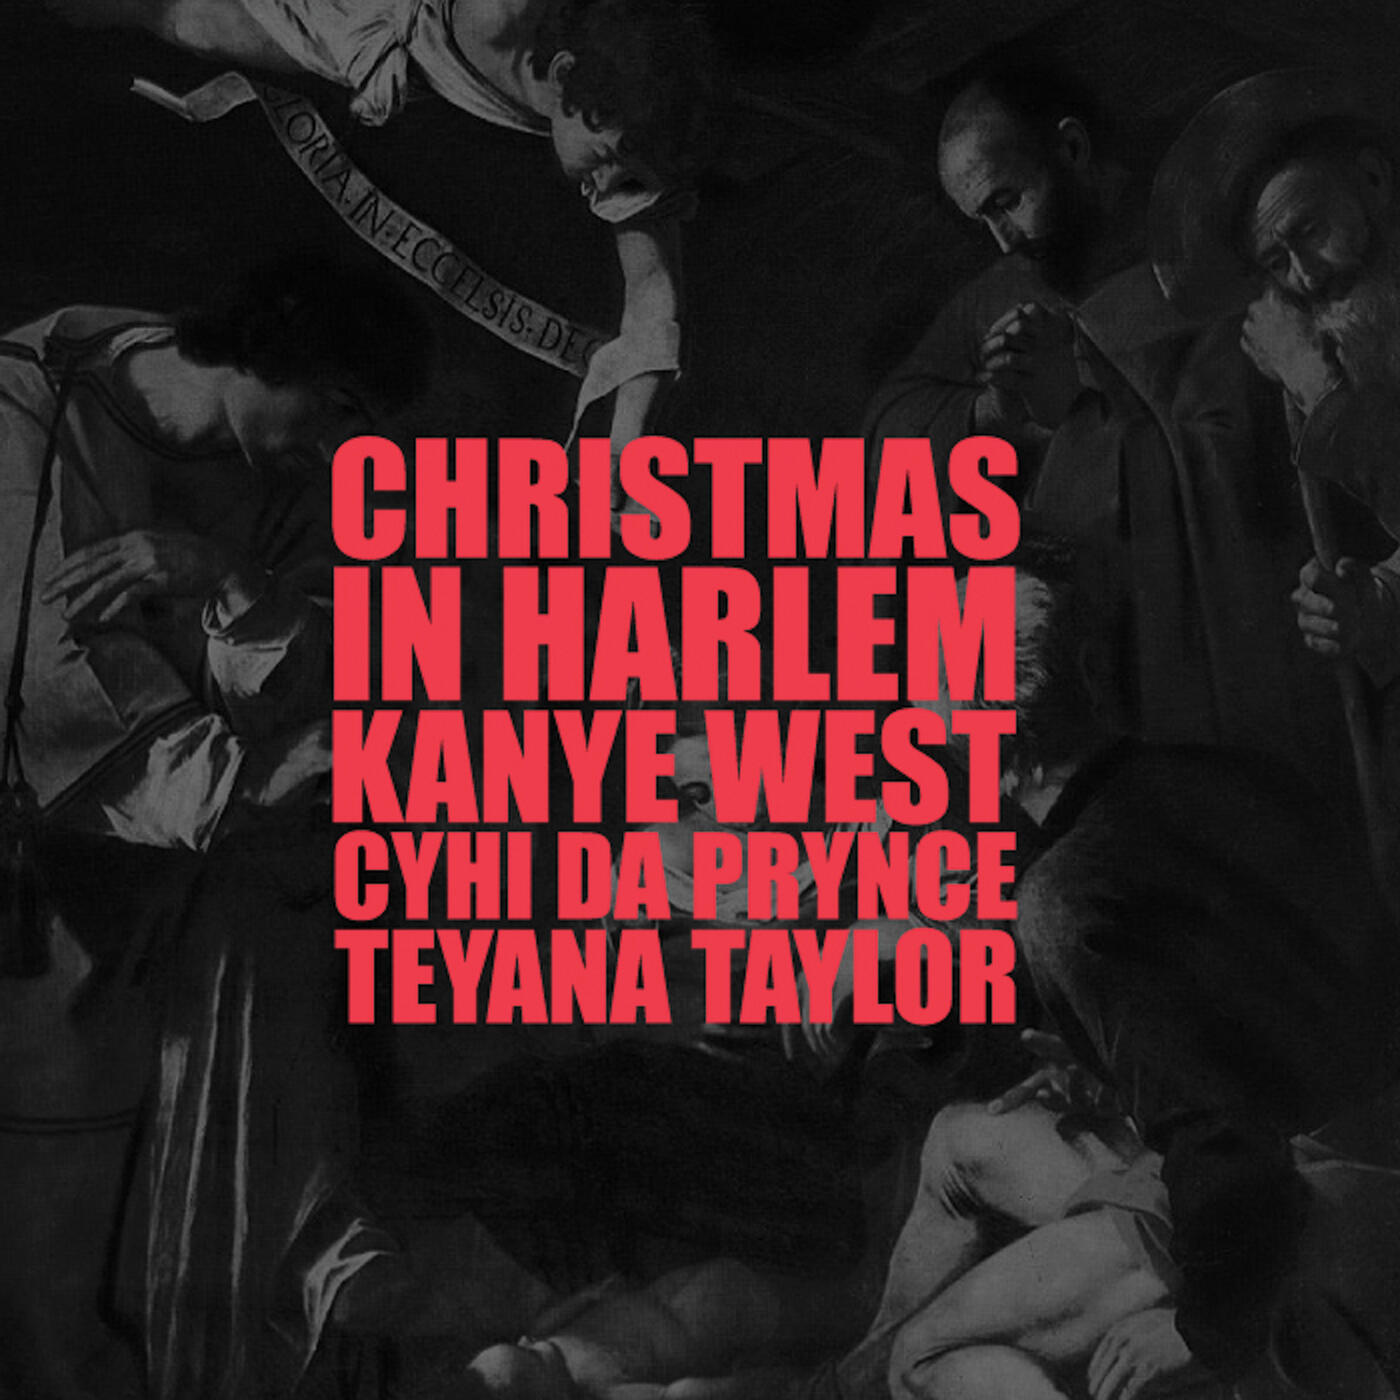 Listen Free to Kanye West - Christmas In Harlem Radio on iHeartRadio ...